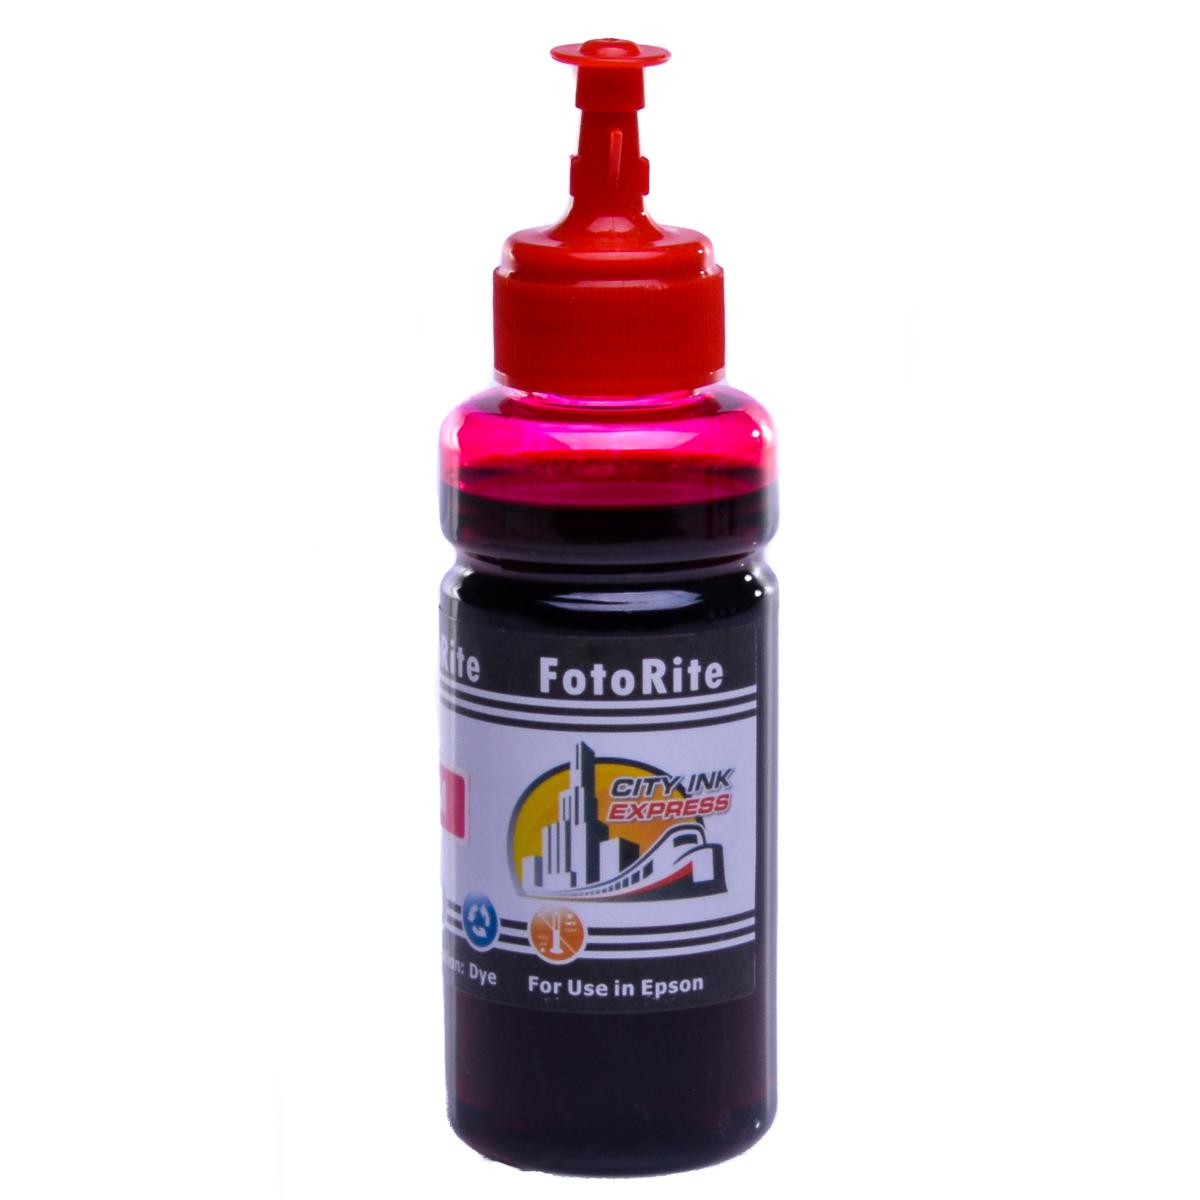 Cheap Magenta dye ink replaces Epson Stylus PX800FW - T0803